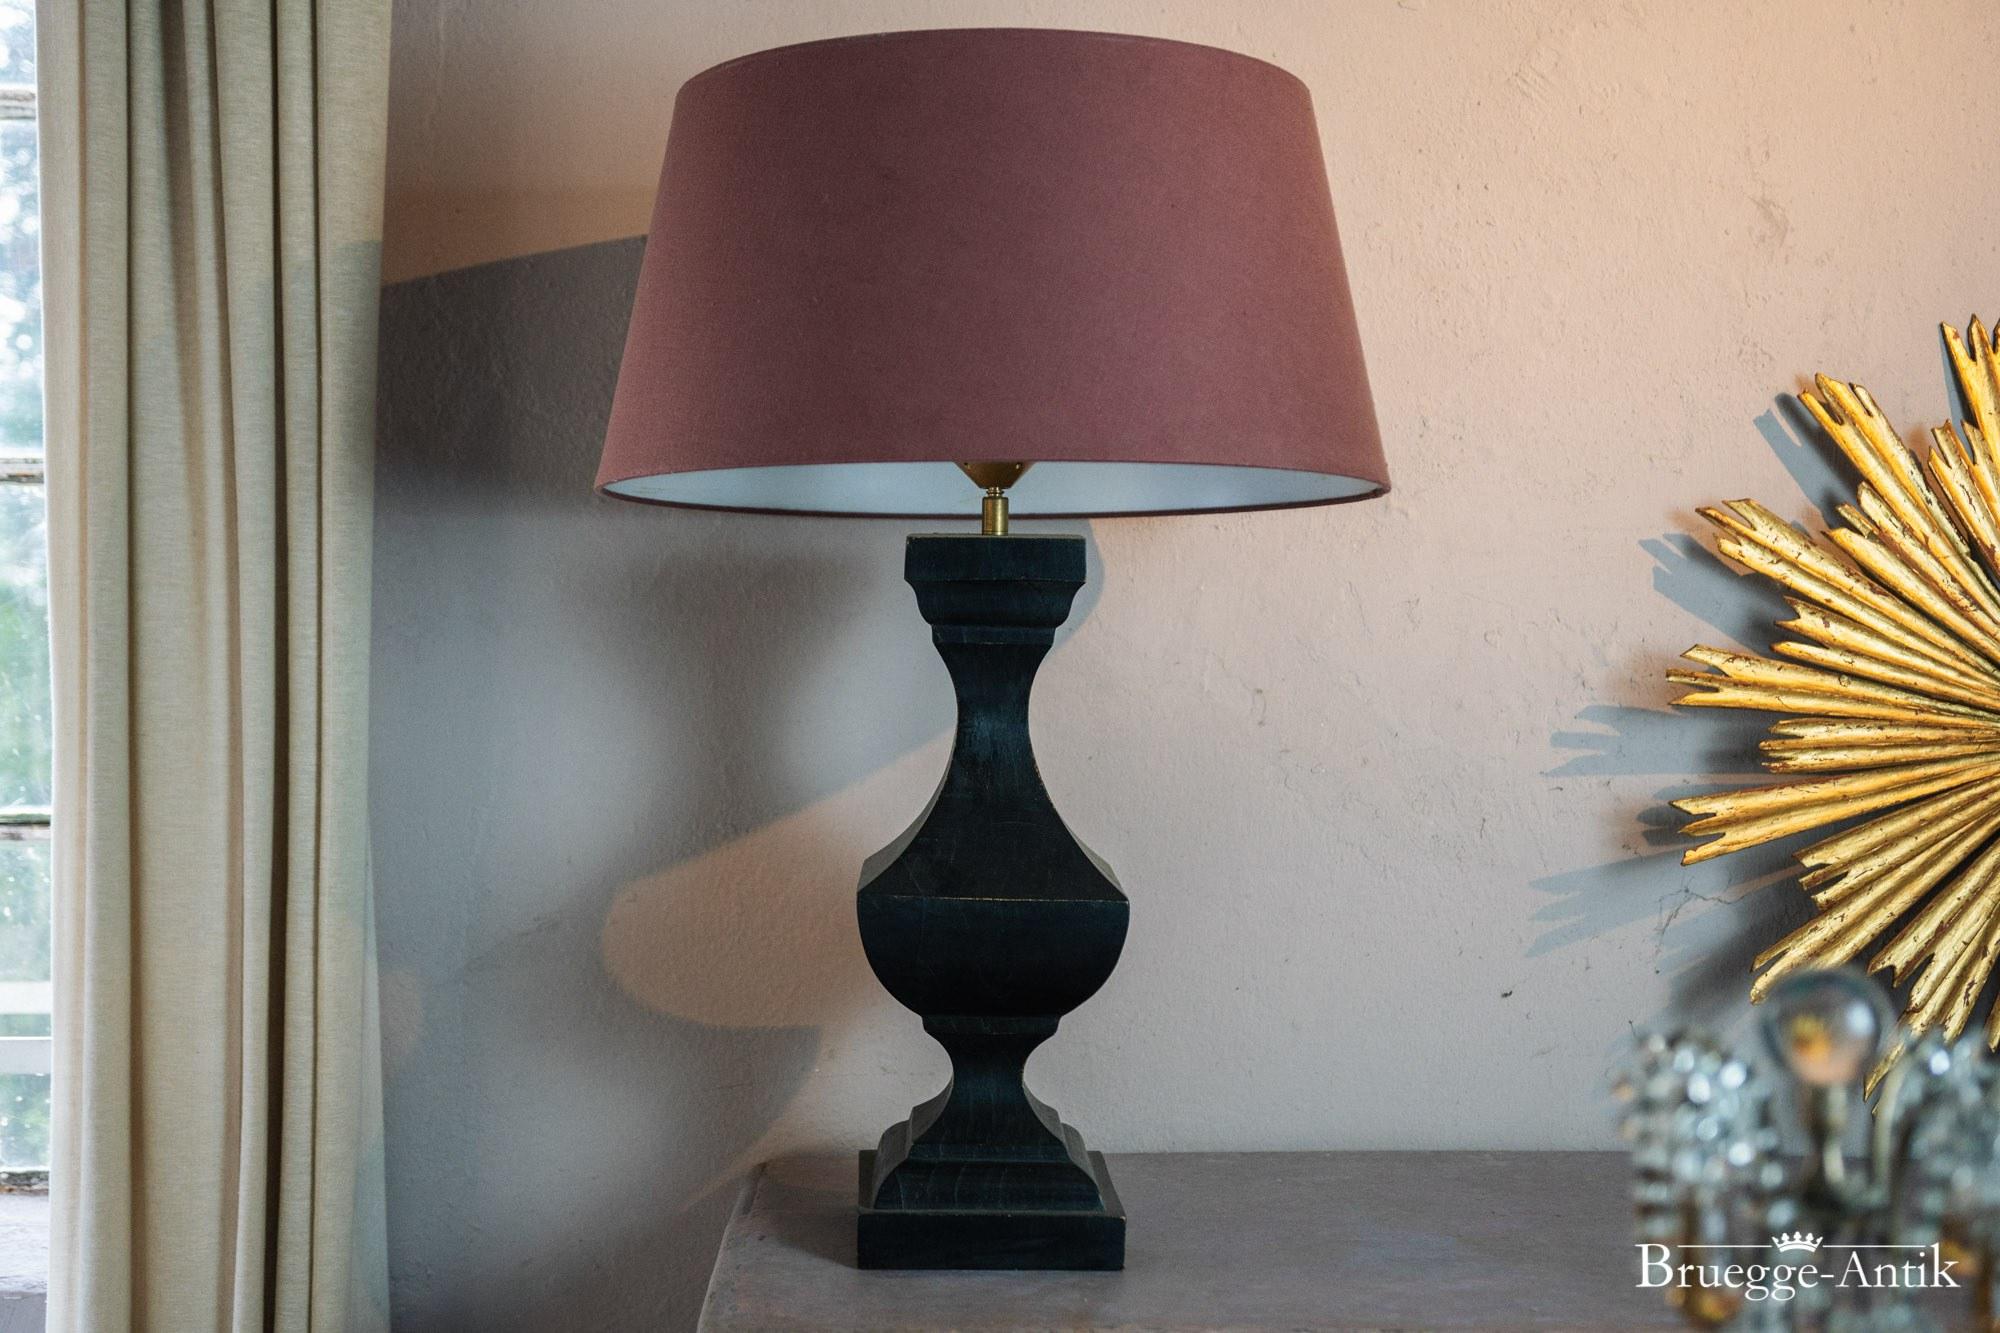 Stehlampe Schwarz Holz Bruegge Antik